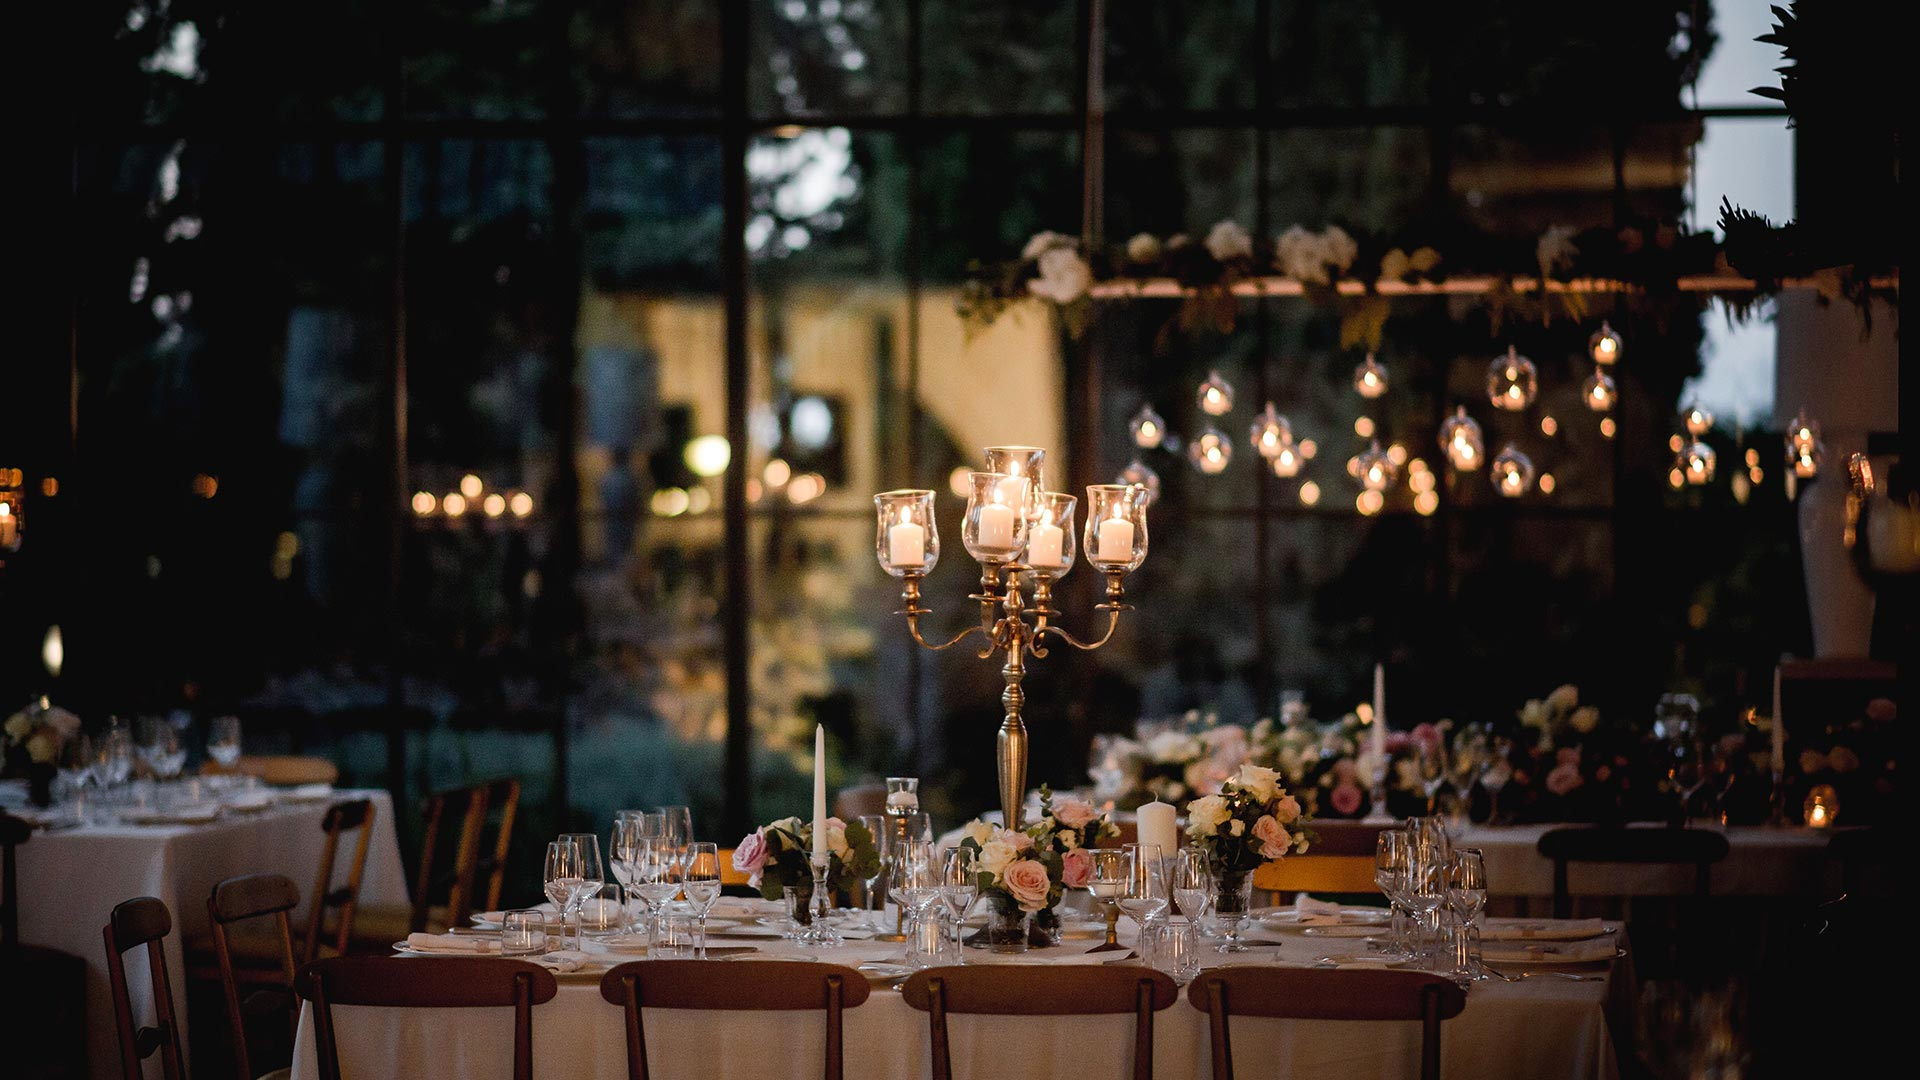 matrimonio autunnale candelabro